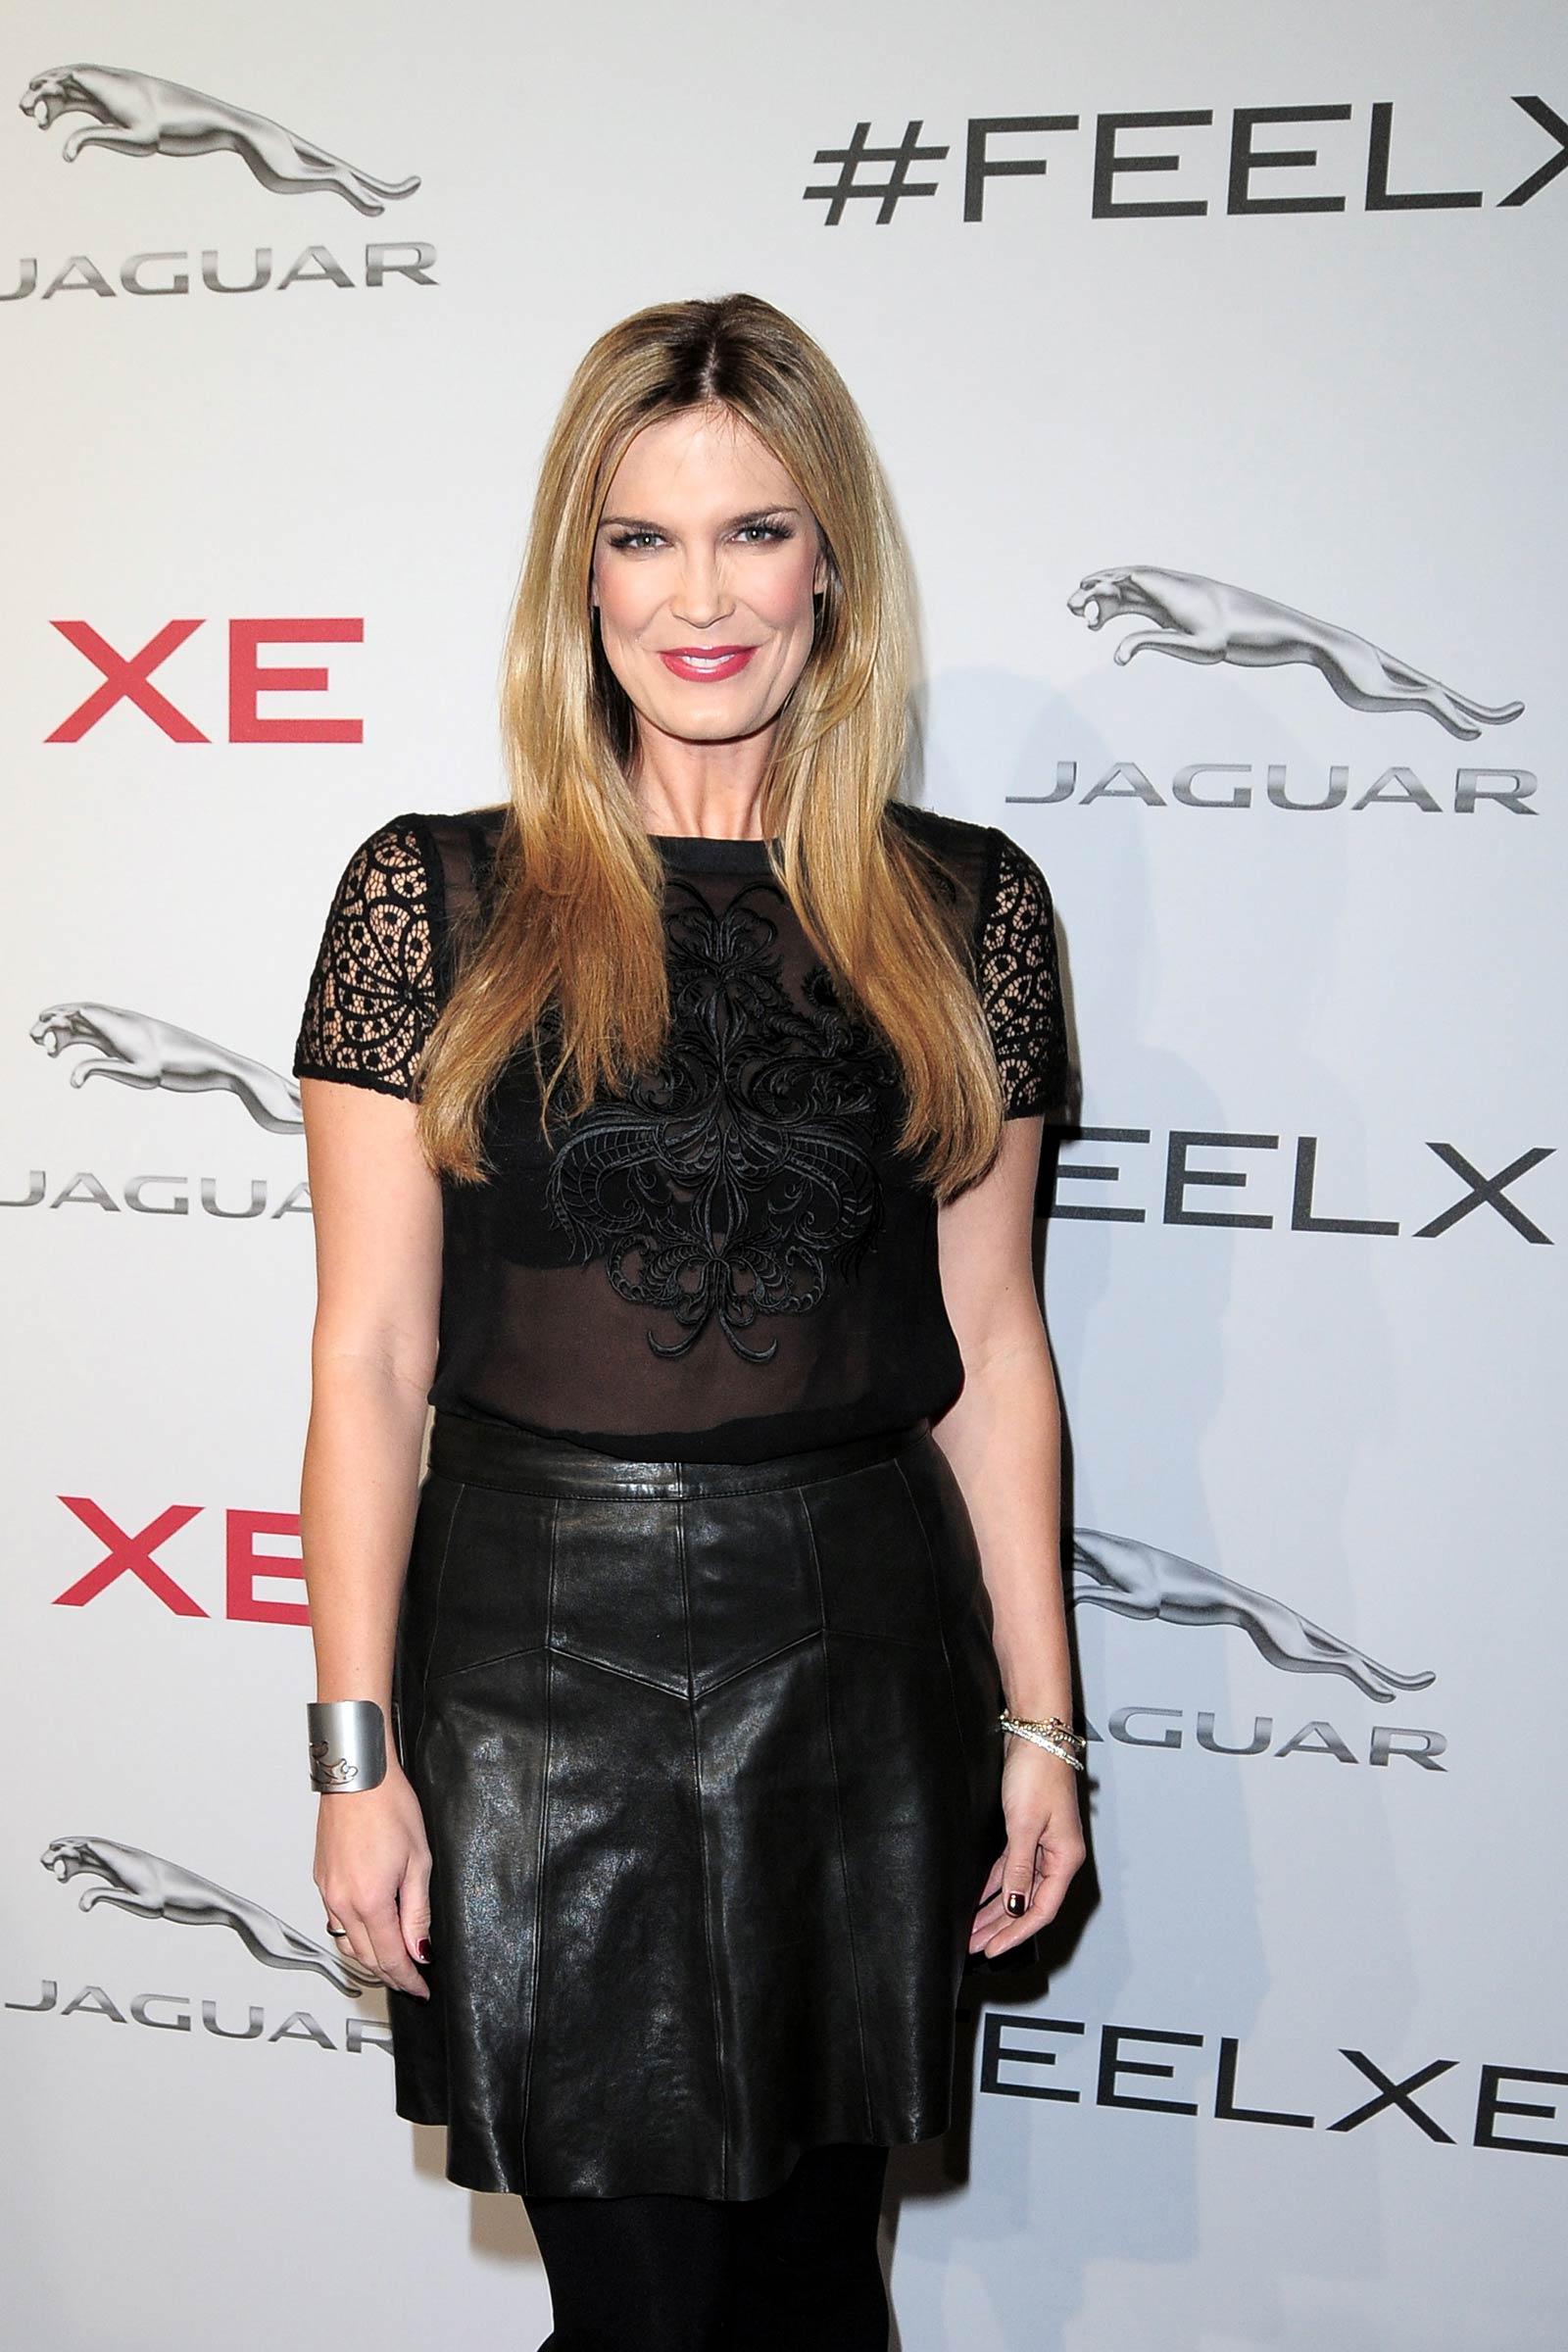 Verena Wriedt attends Jaguar XE premiere